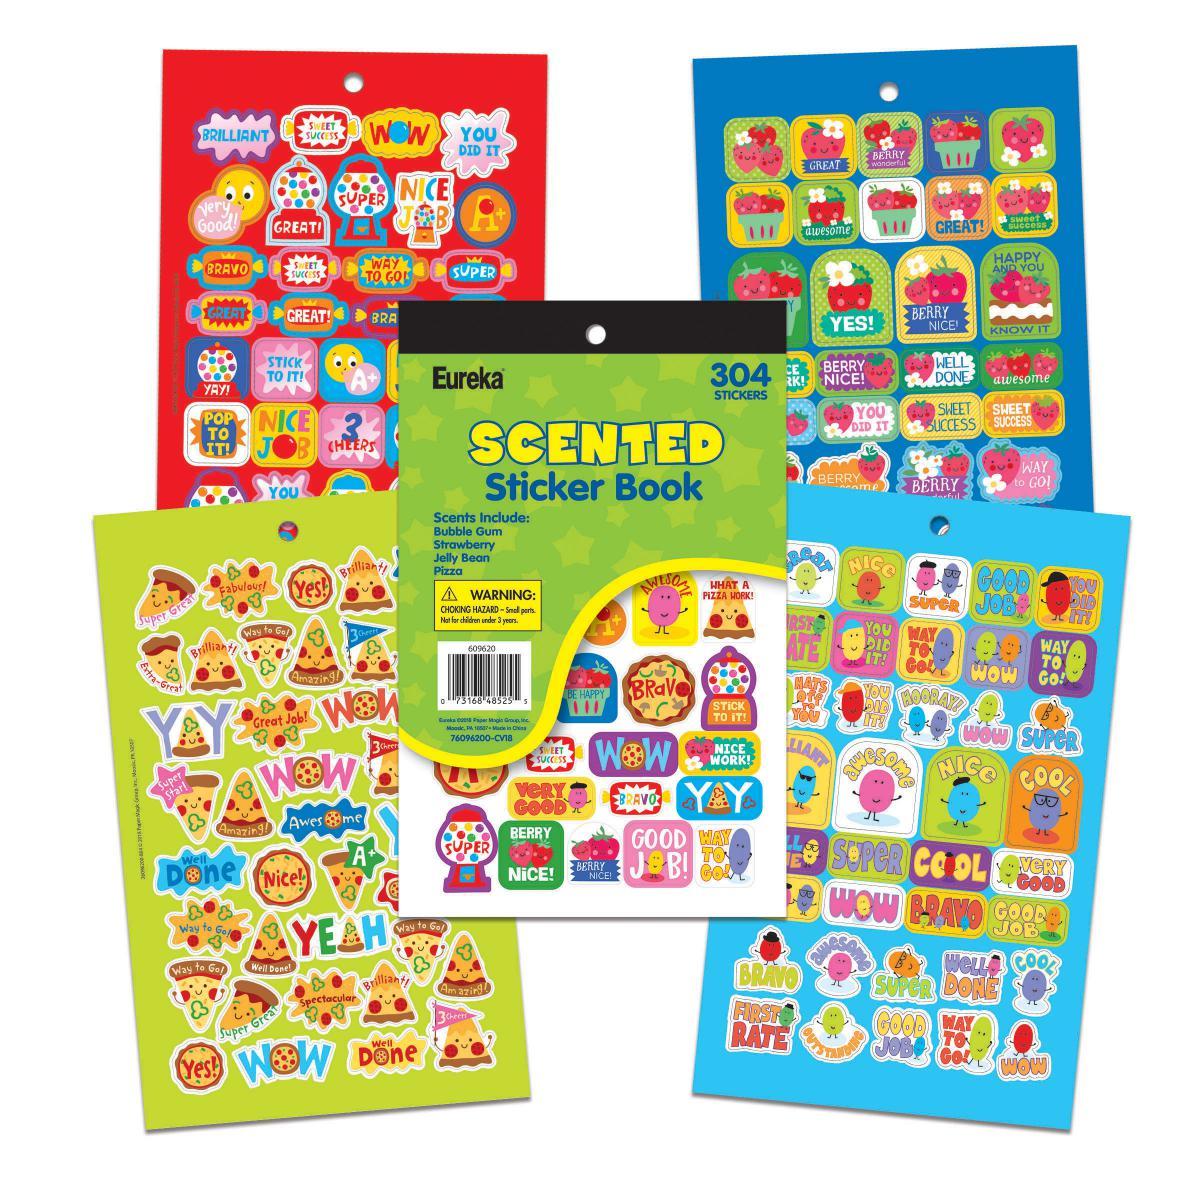 Scented Sticker Book